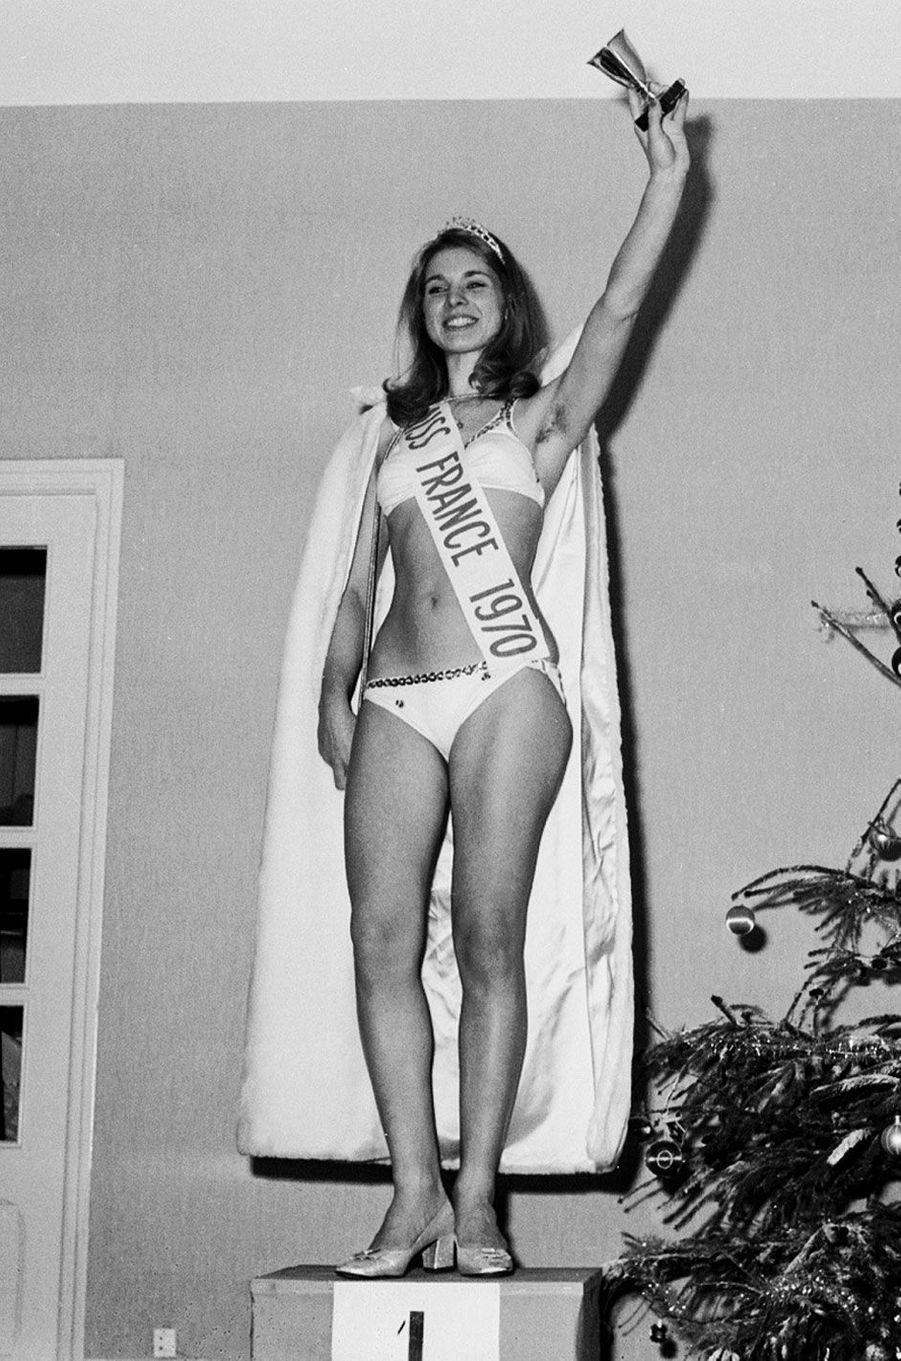 Miss France 1970, Michelle Beaurain